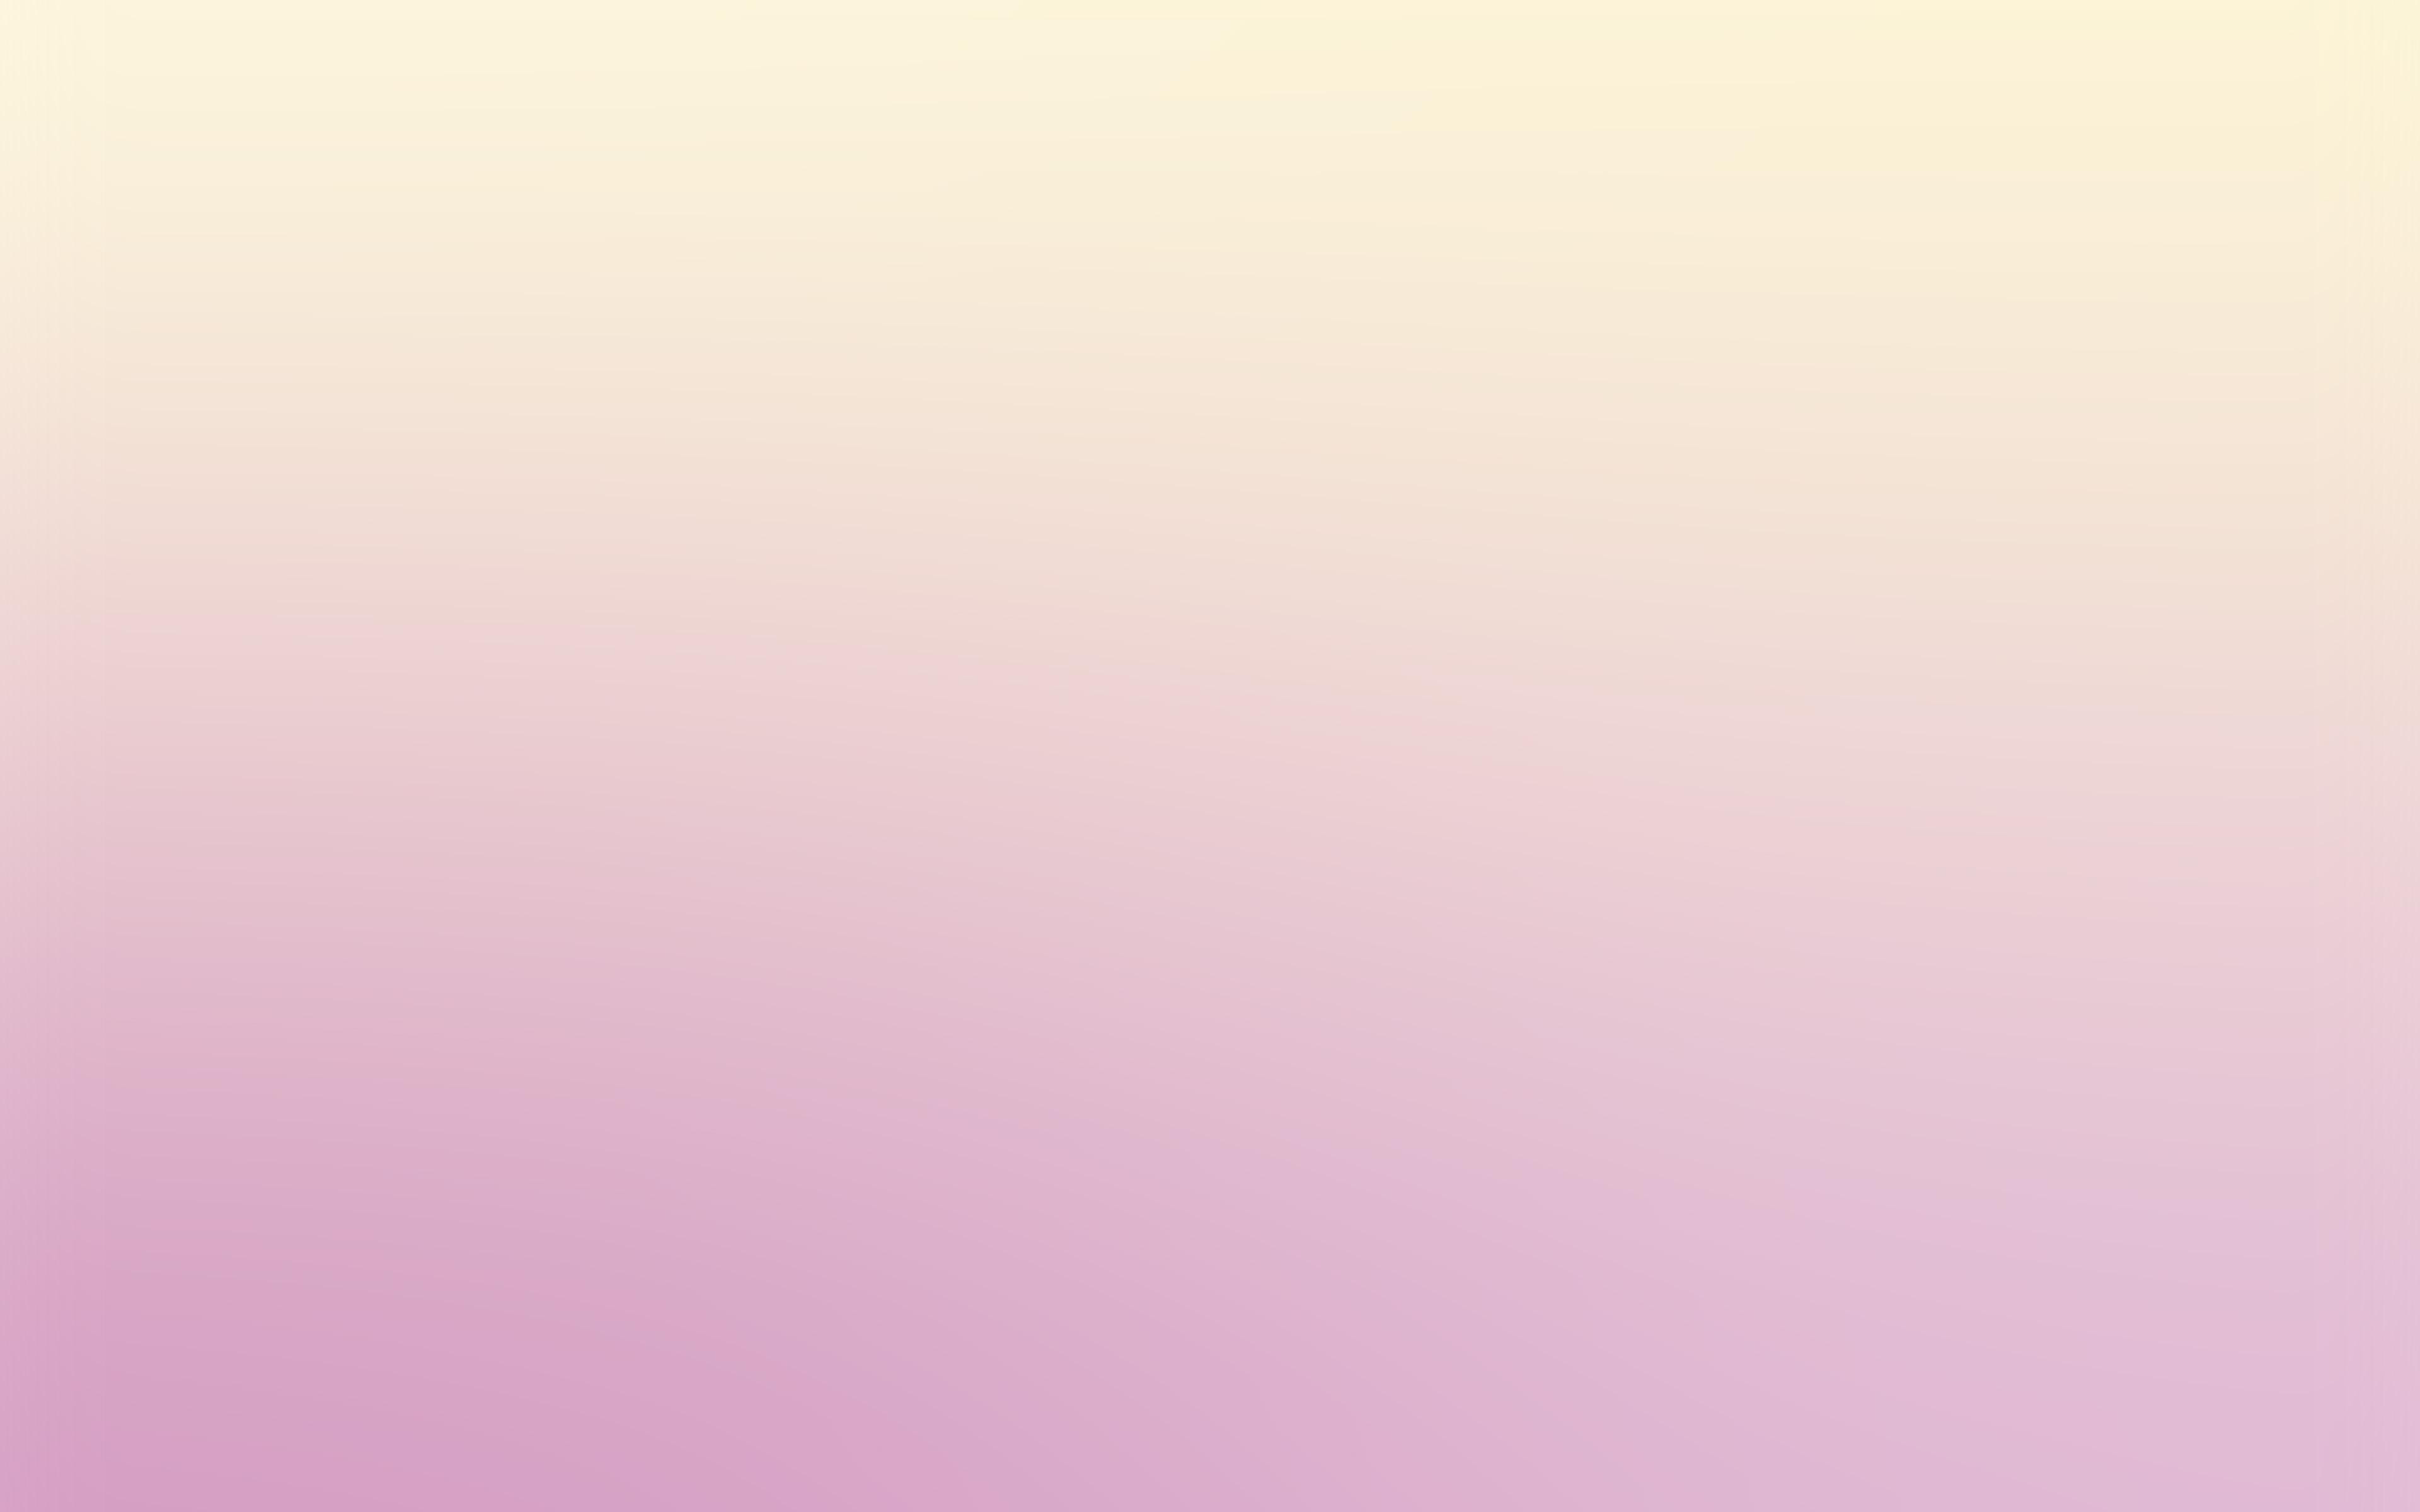 Cute Pink Pastel Wallpaper Sm46 Pastel Pink Blur Gradation Wallpaper